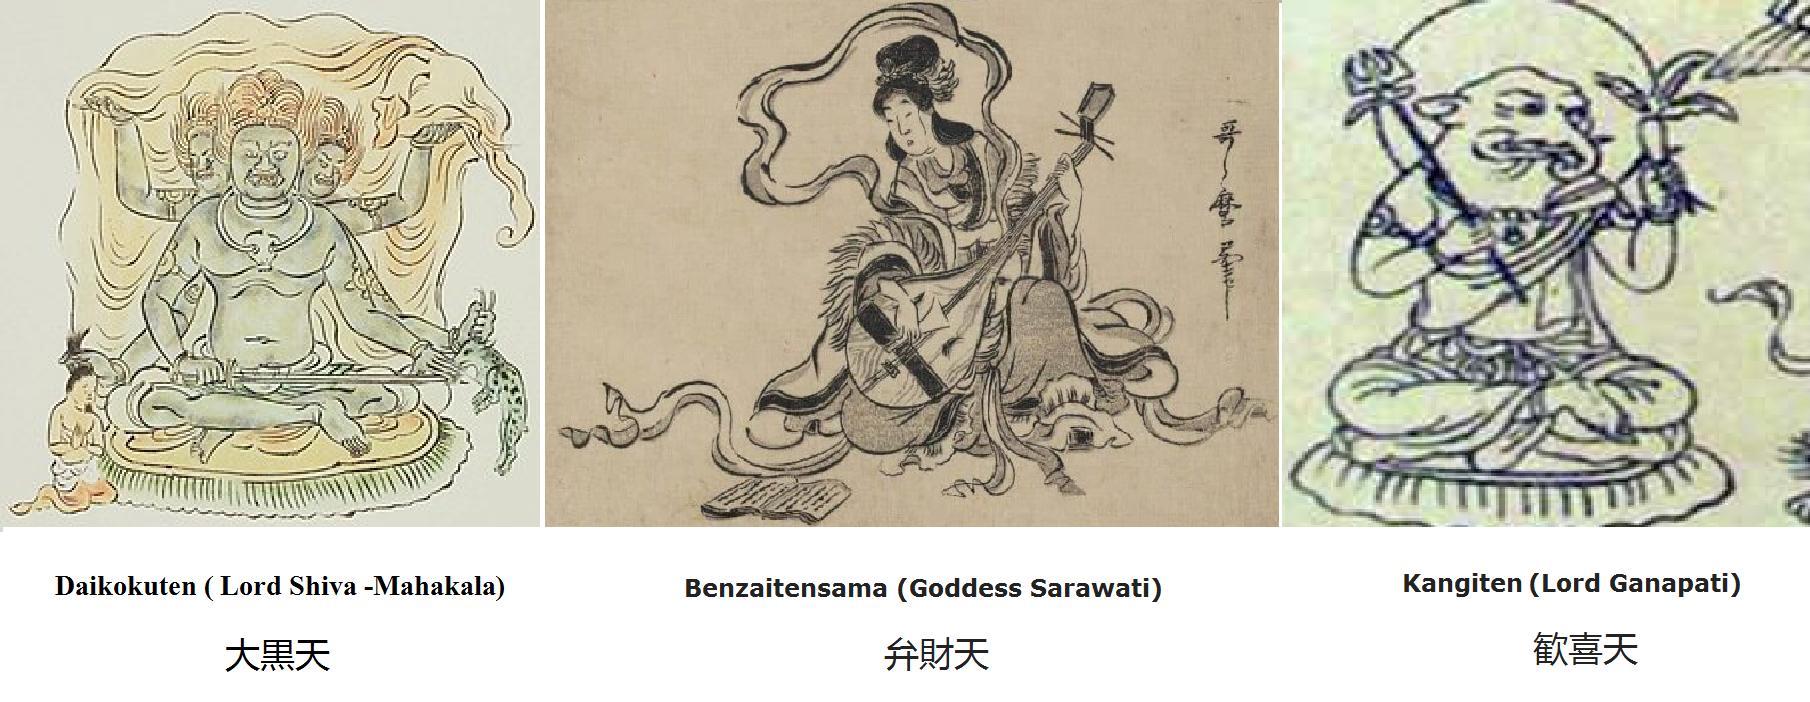 Shinto Hindu Similarities